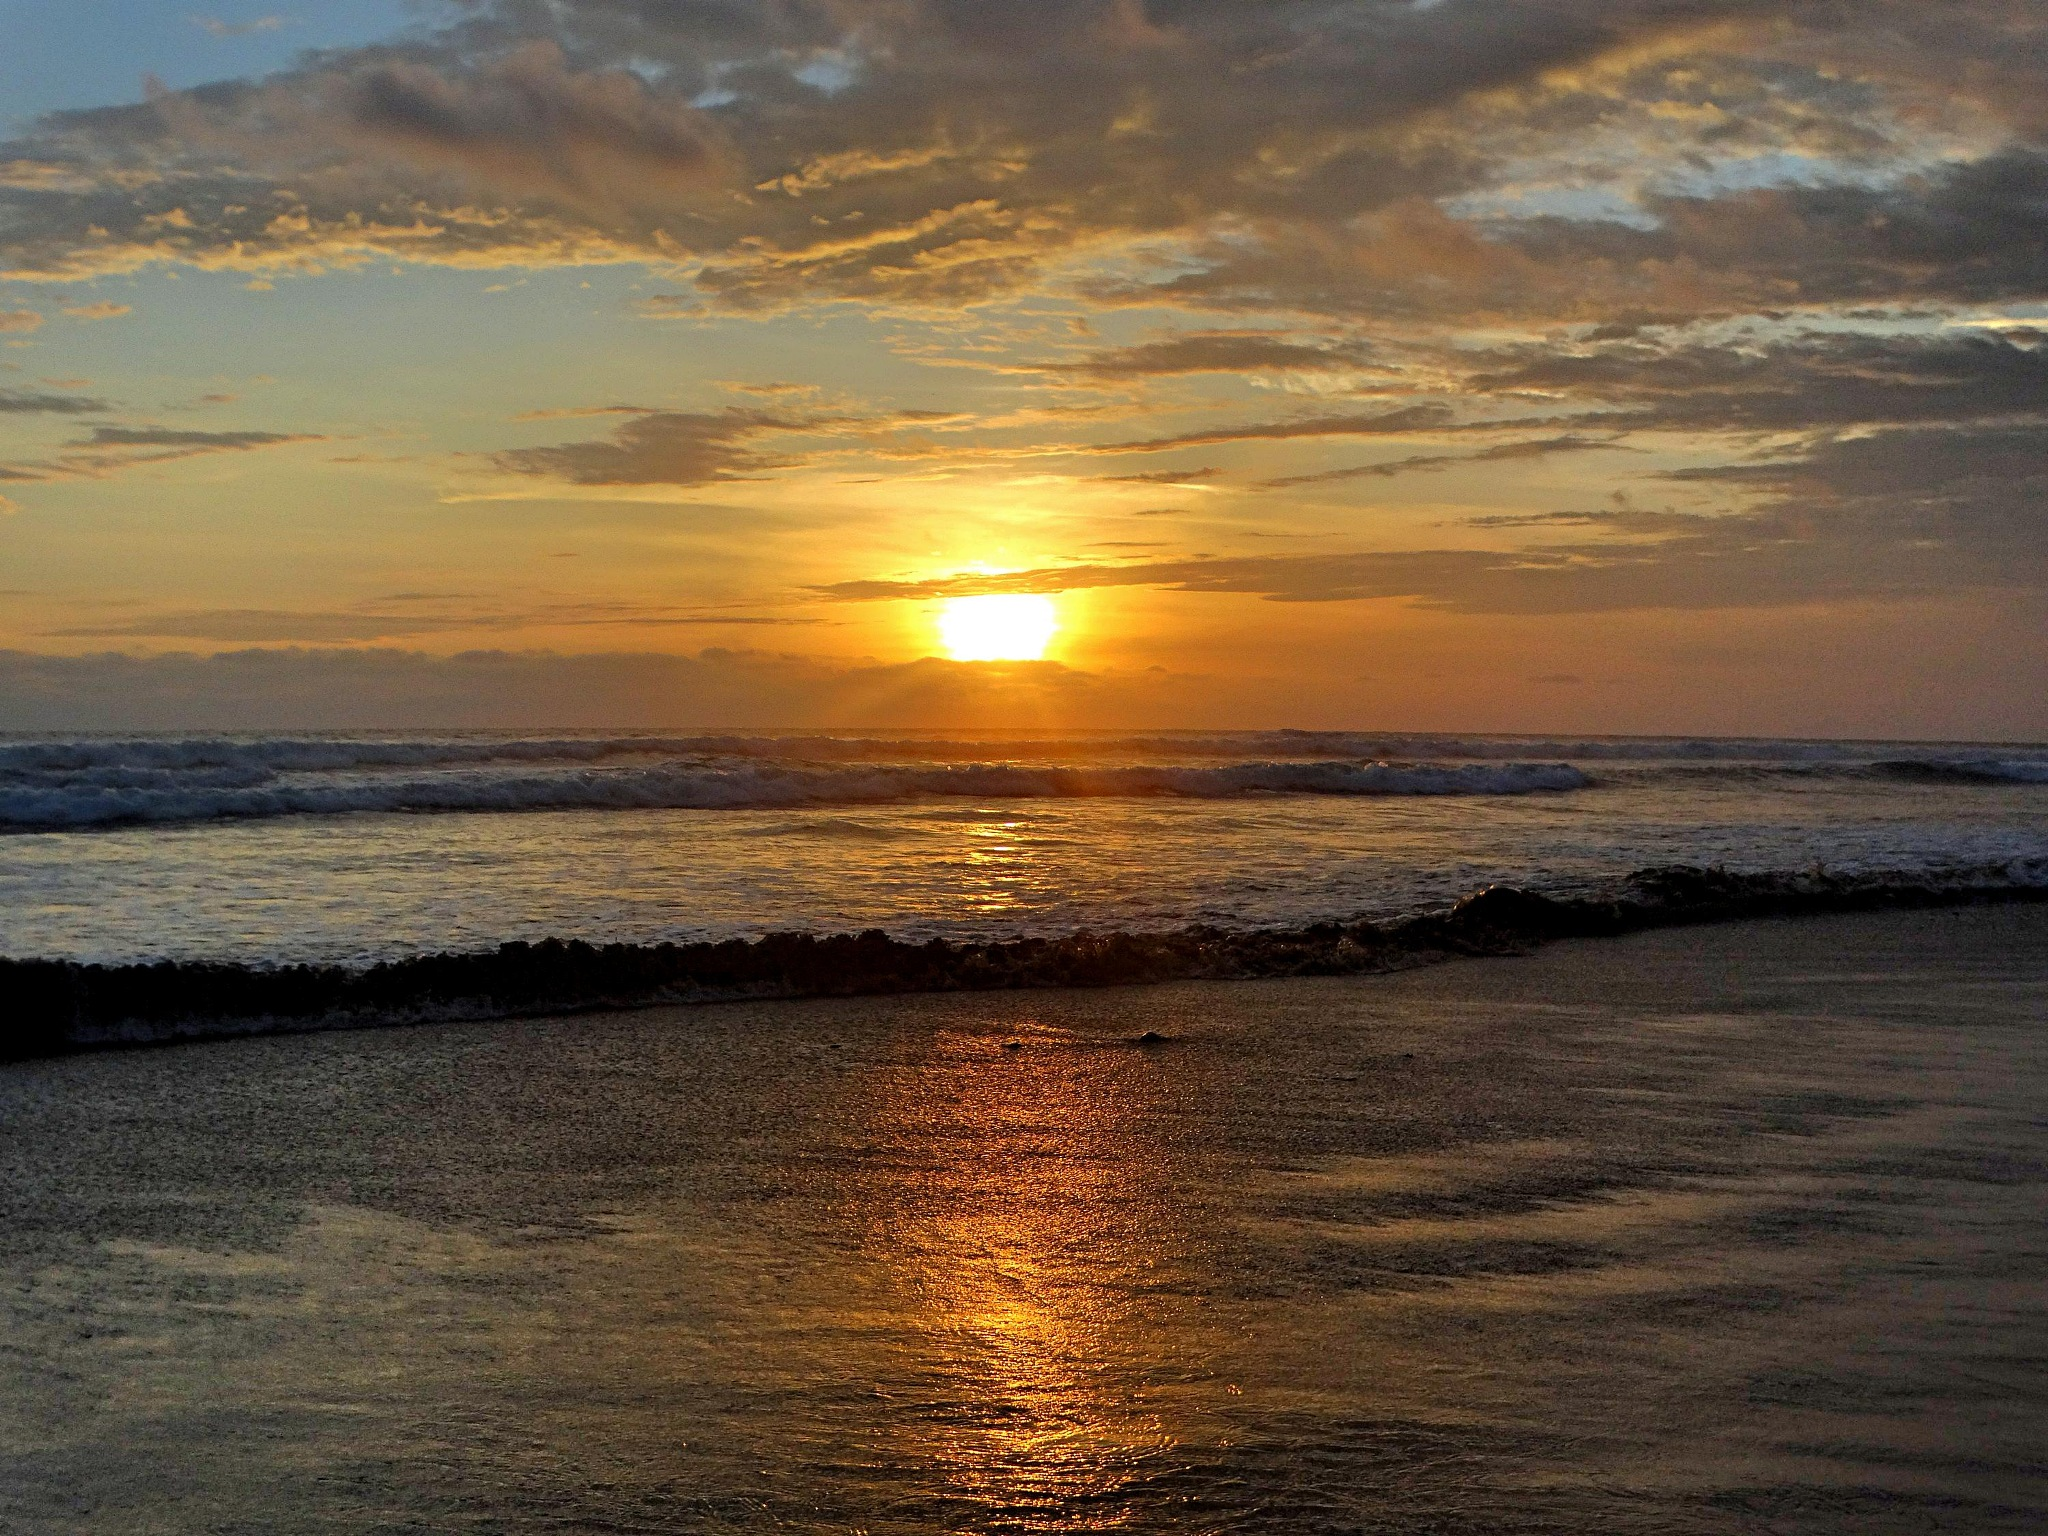 sunset by Johnny Chunga